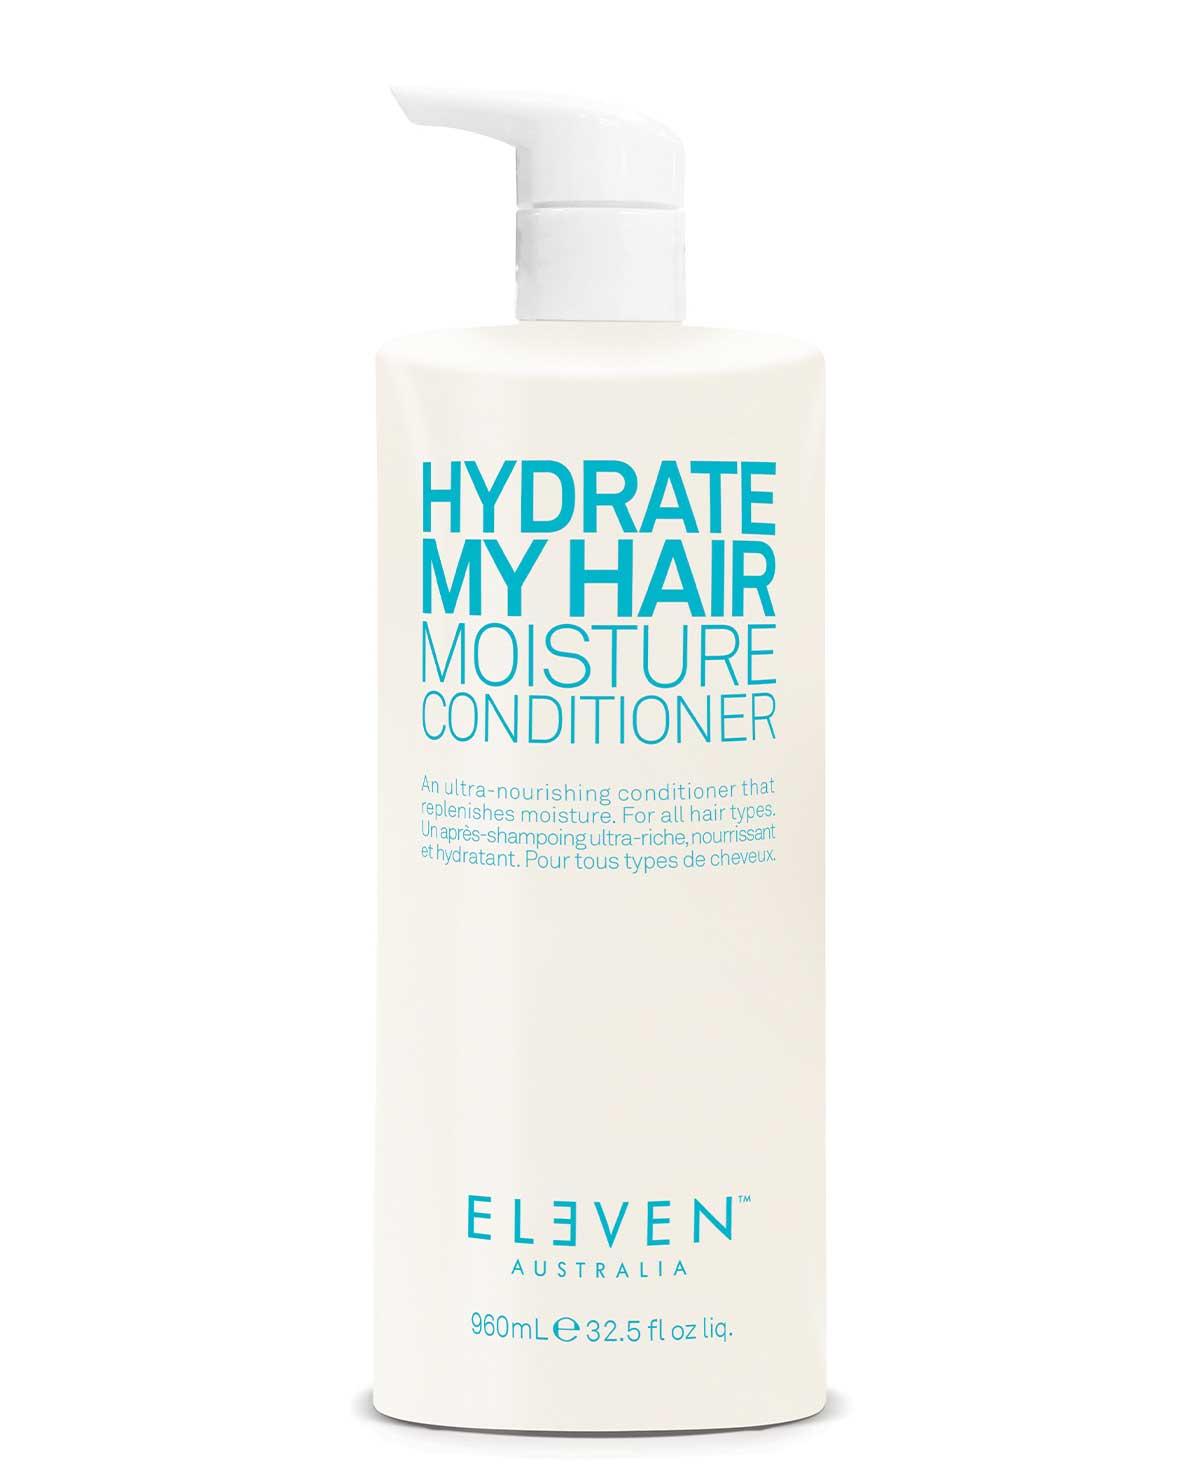 Eleven Hydrate My Hair Moisture Conditioner 960ml